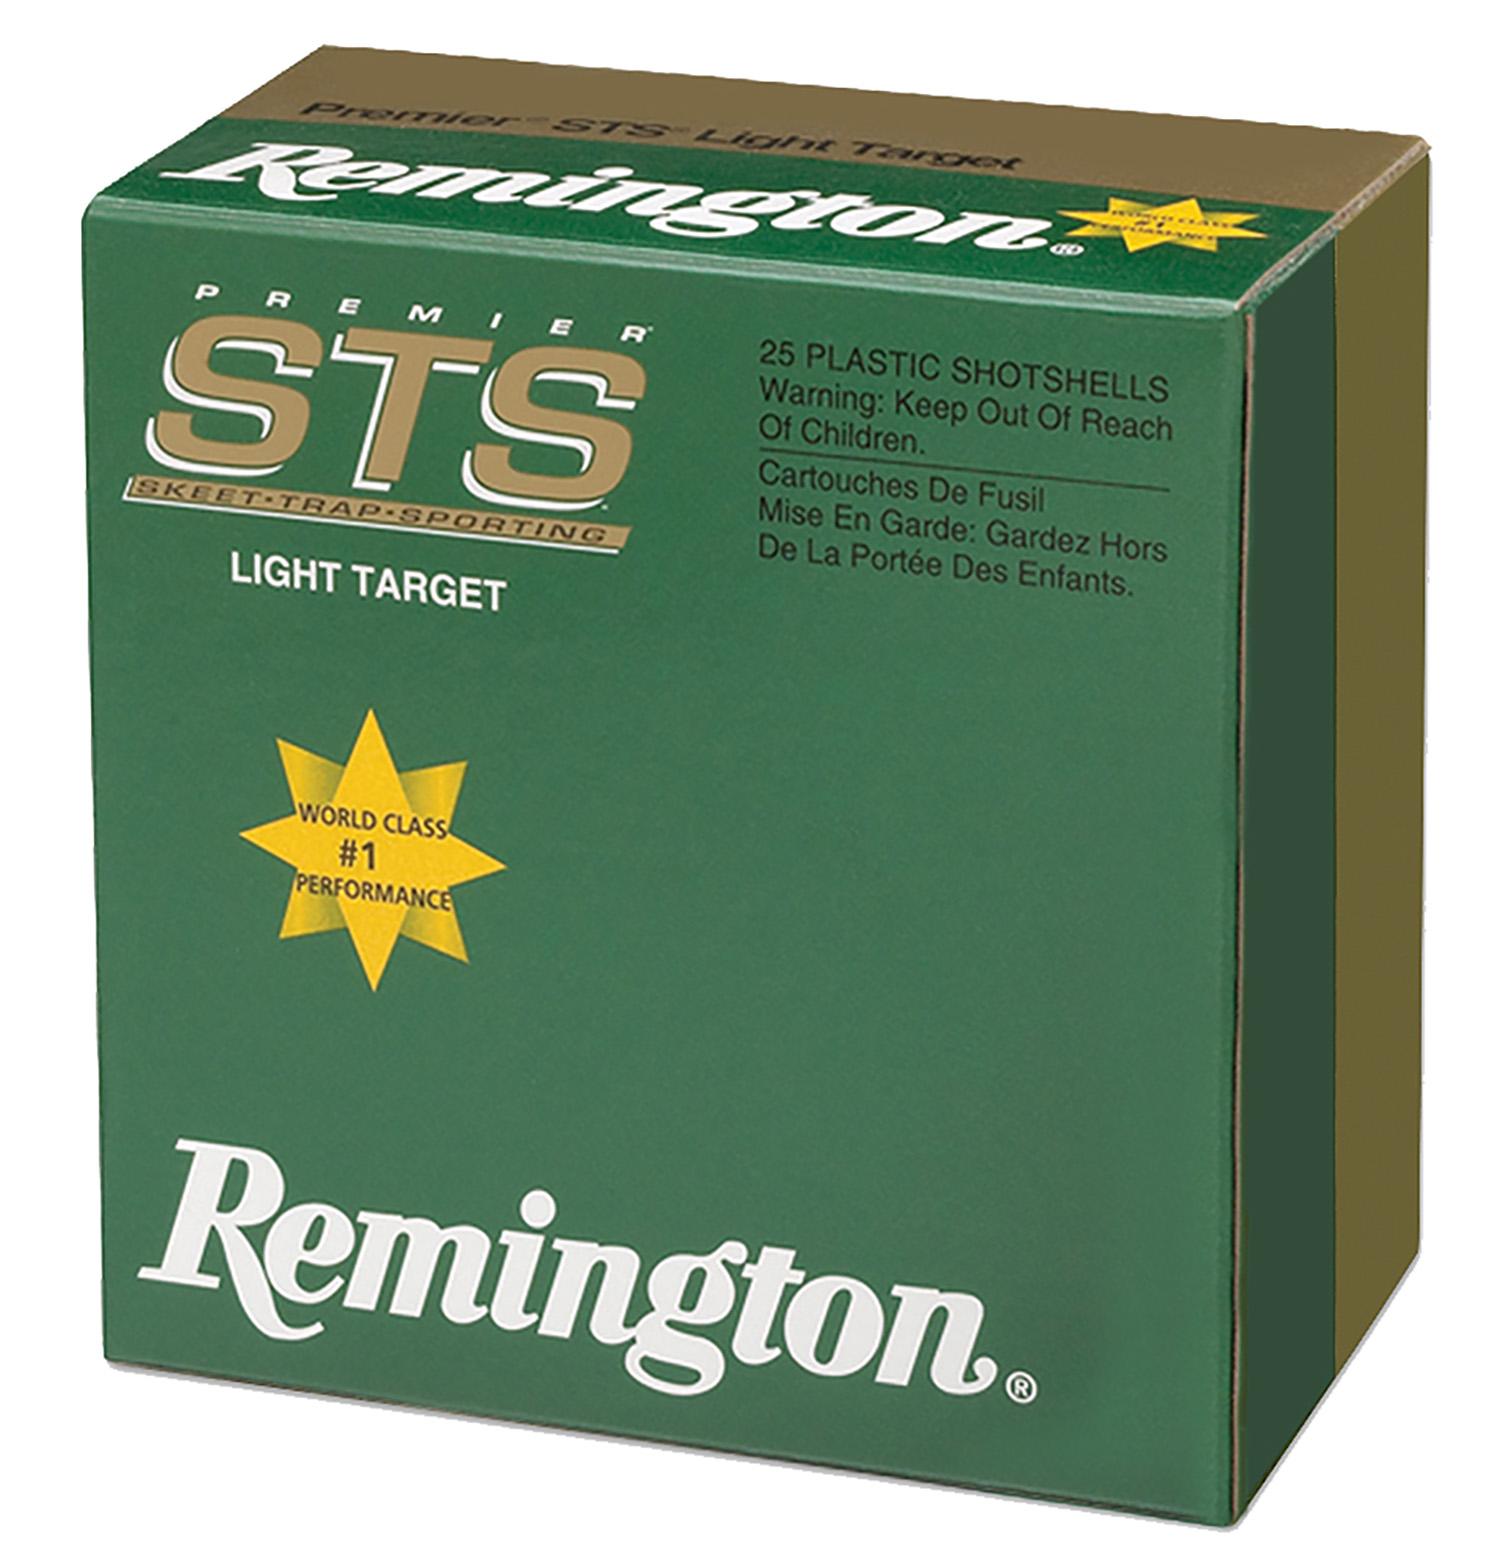 Remington Ammunition STS12LH8 Premier STS Target Load  12 Gauge 2.75